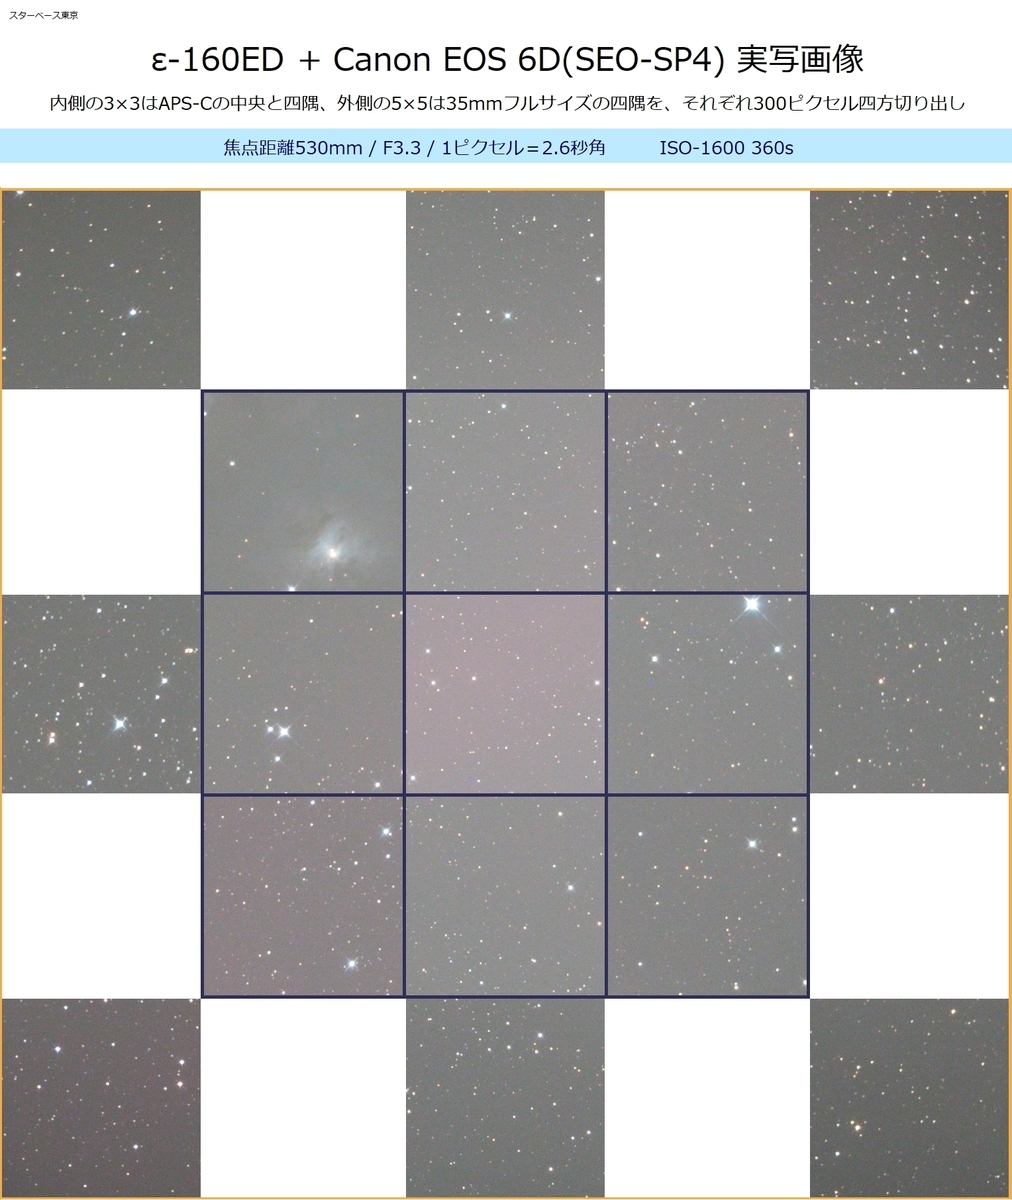 f:id:starbase:20201121181025j:plain